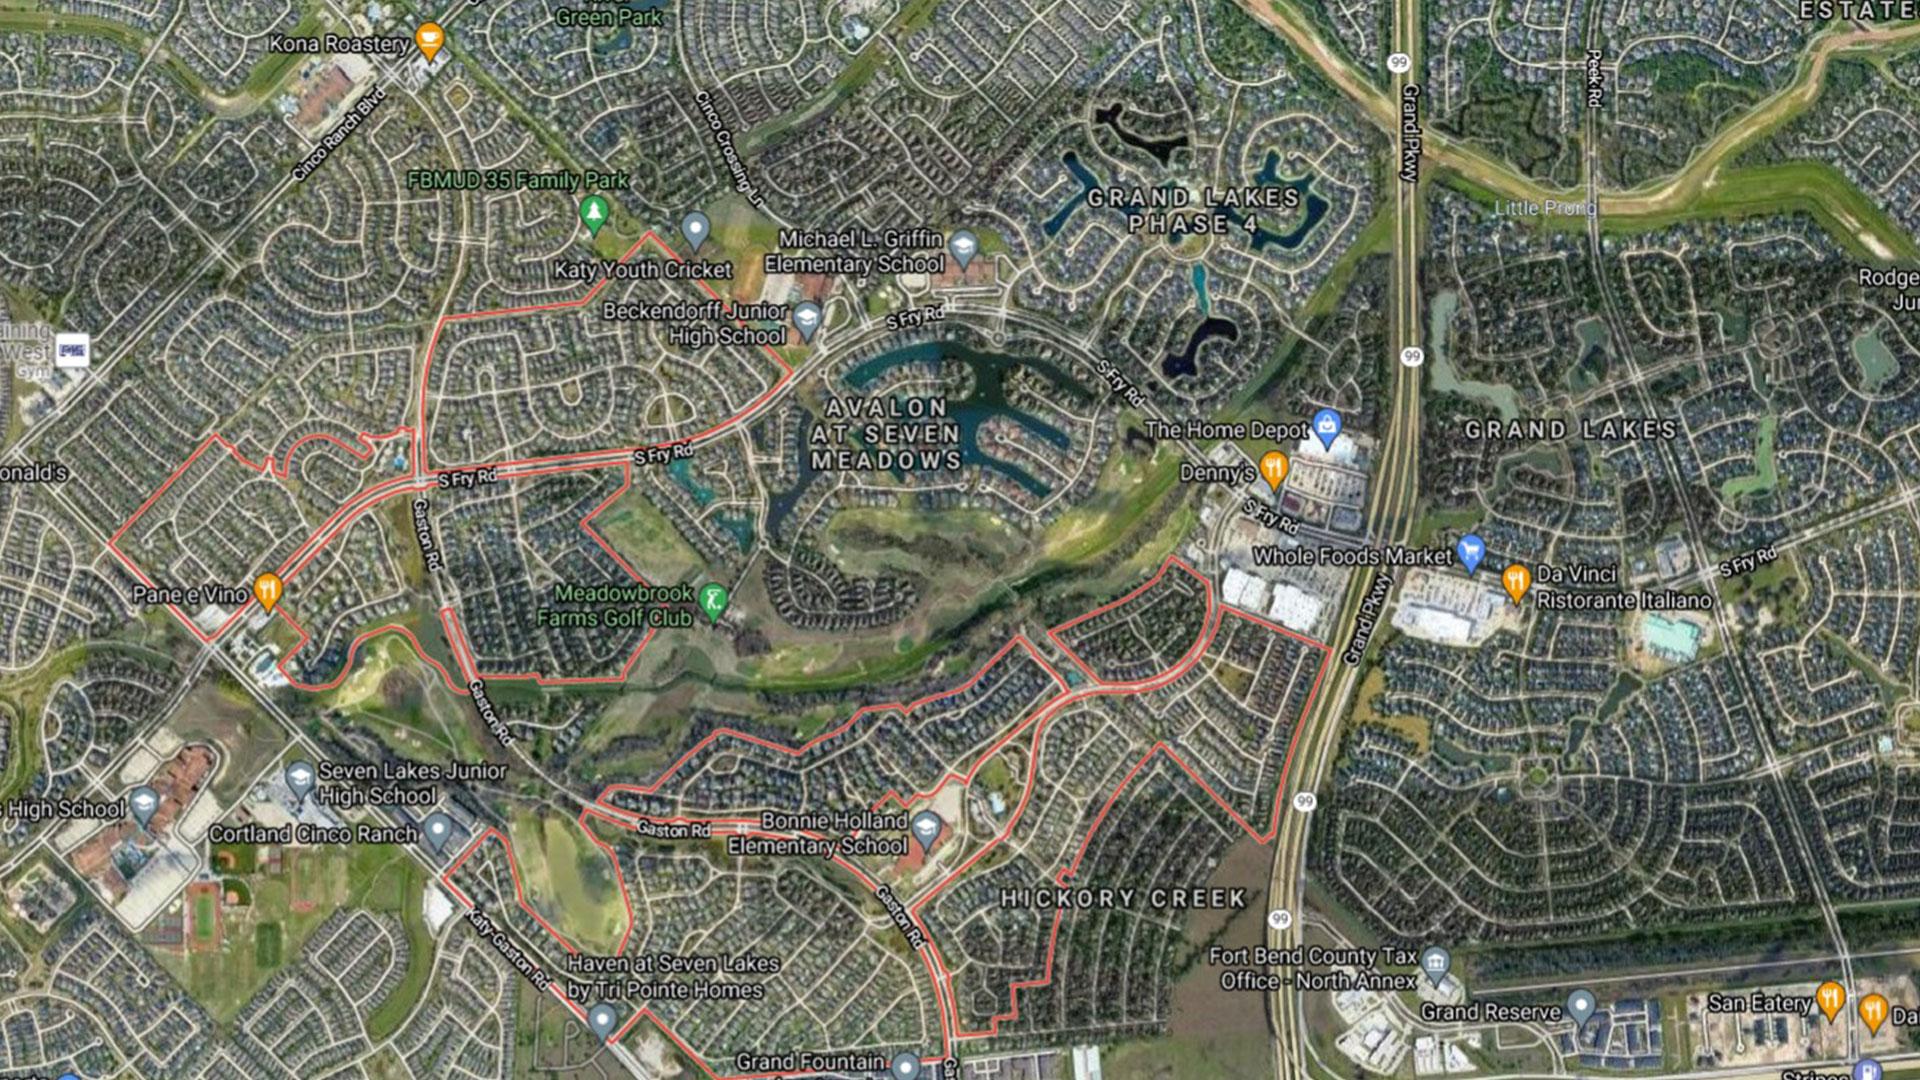 West-Houston-Neighborhood---SEVEN-MEADOWS